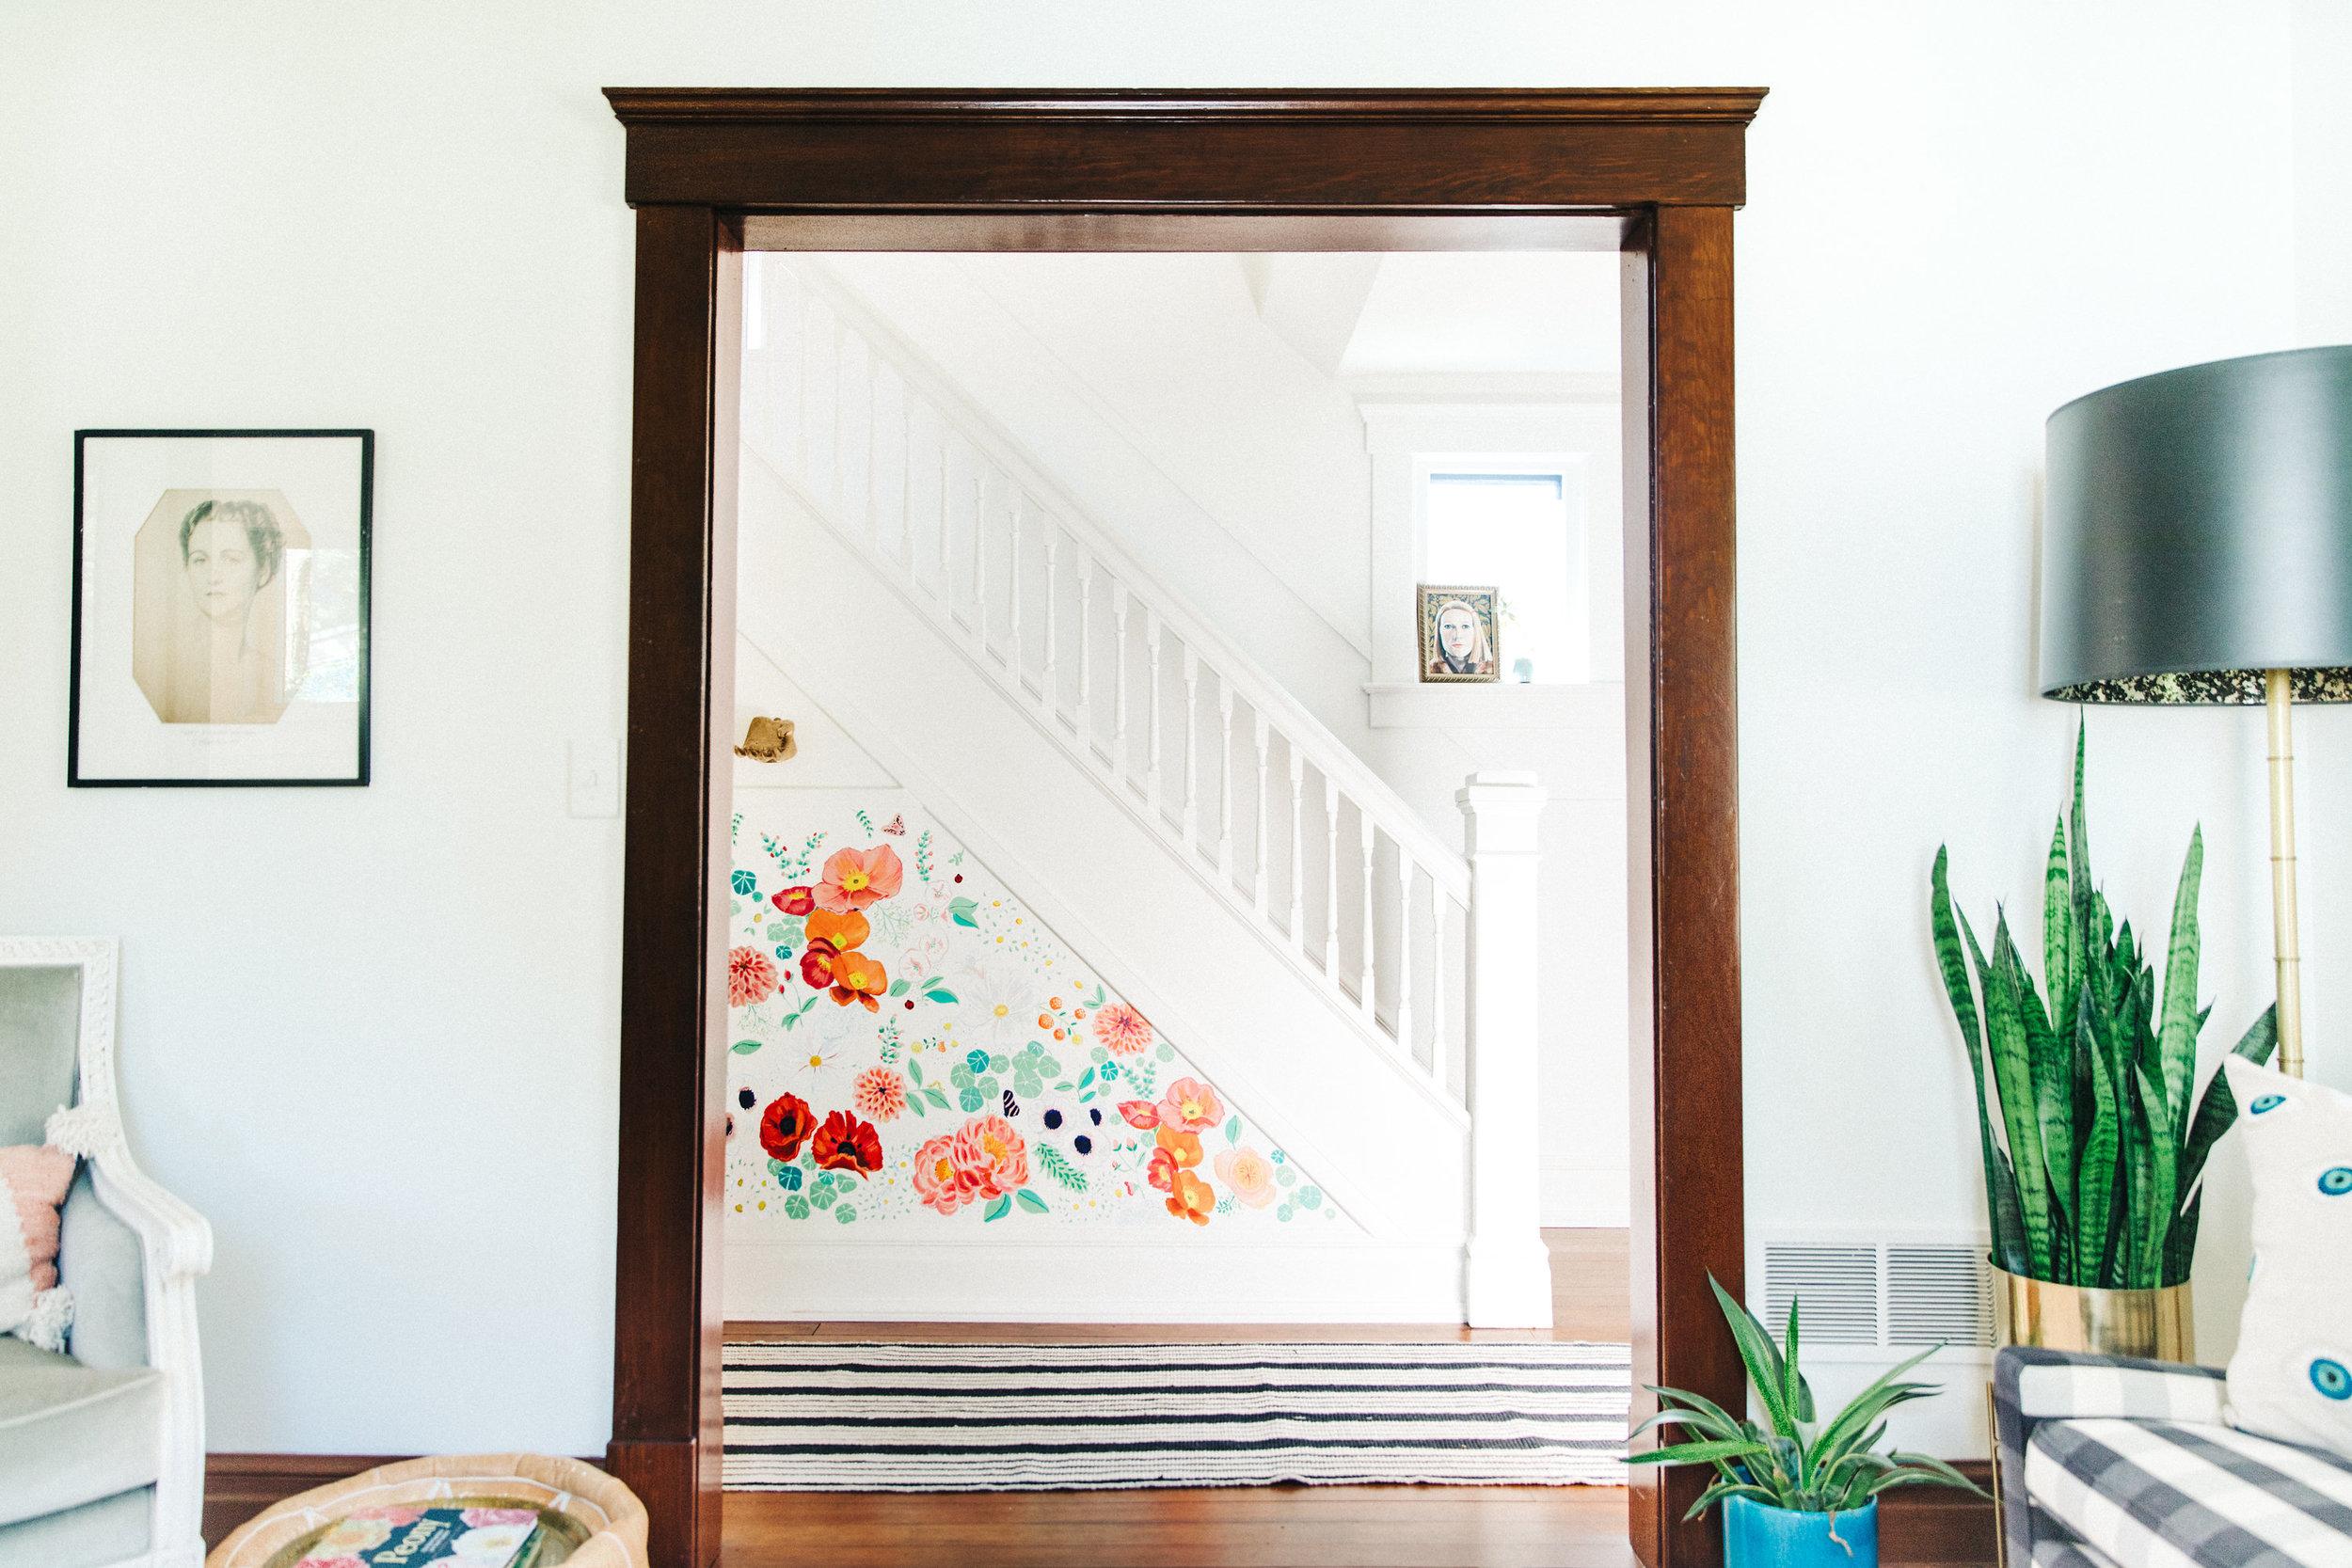 tb-home-mural-39.jpg